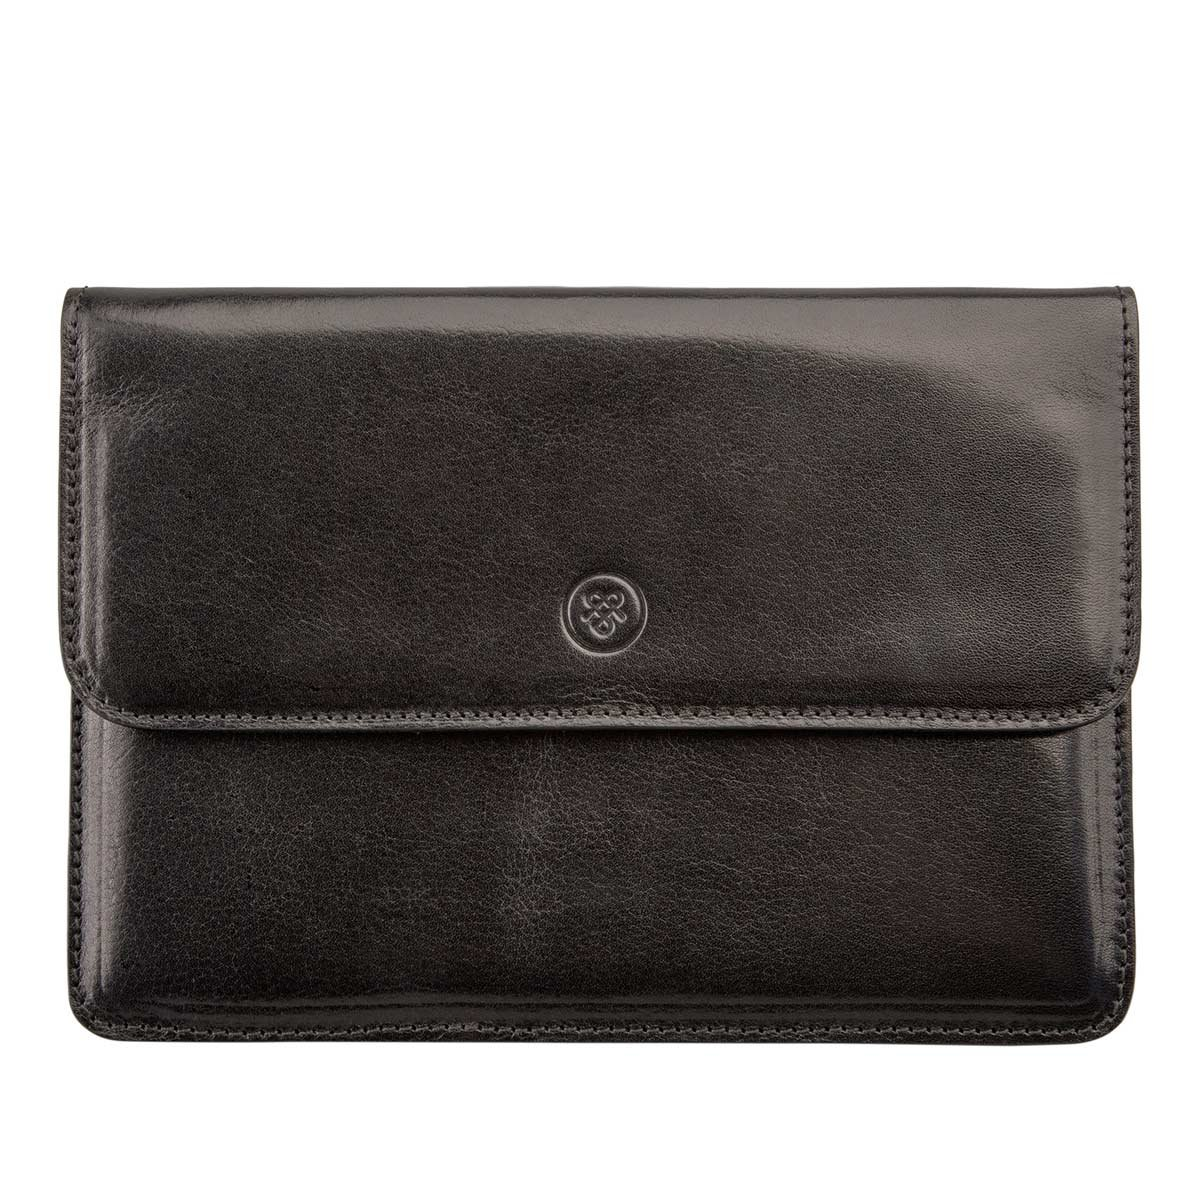 Torrino Maxwell Scott Personalized Luxury Leather Travel Document Holder